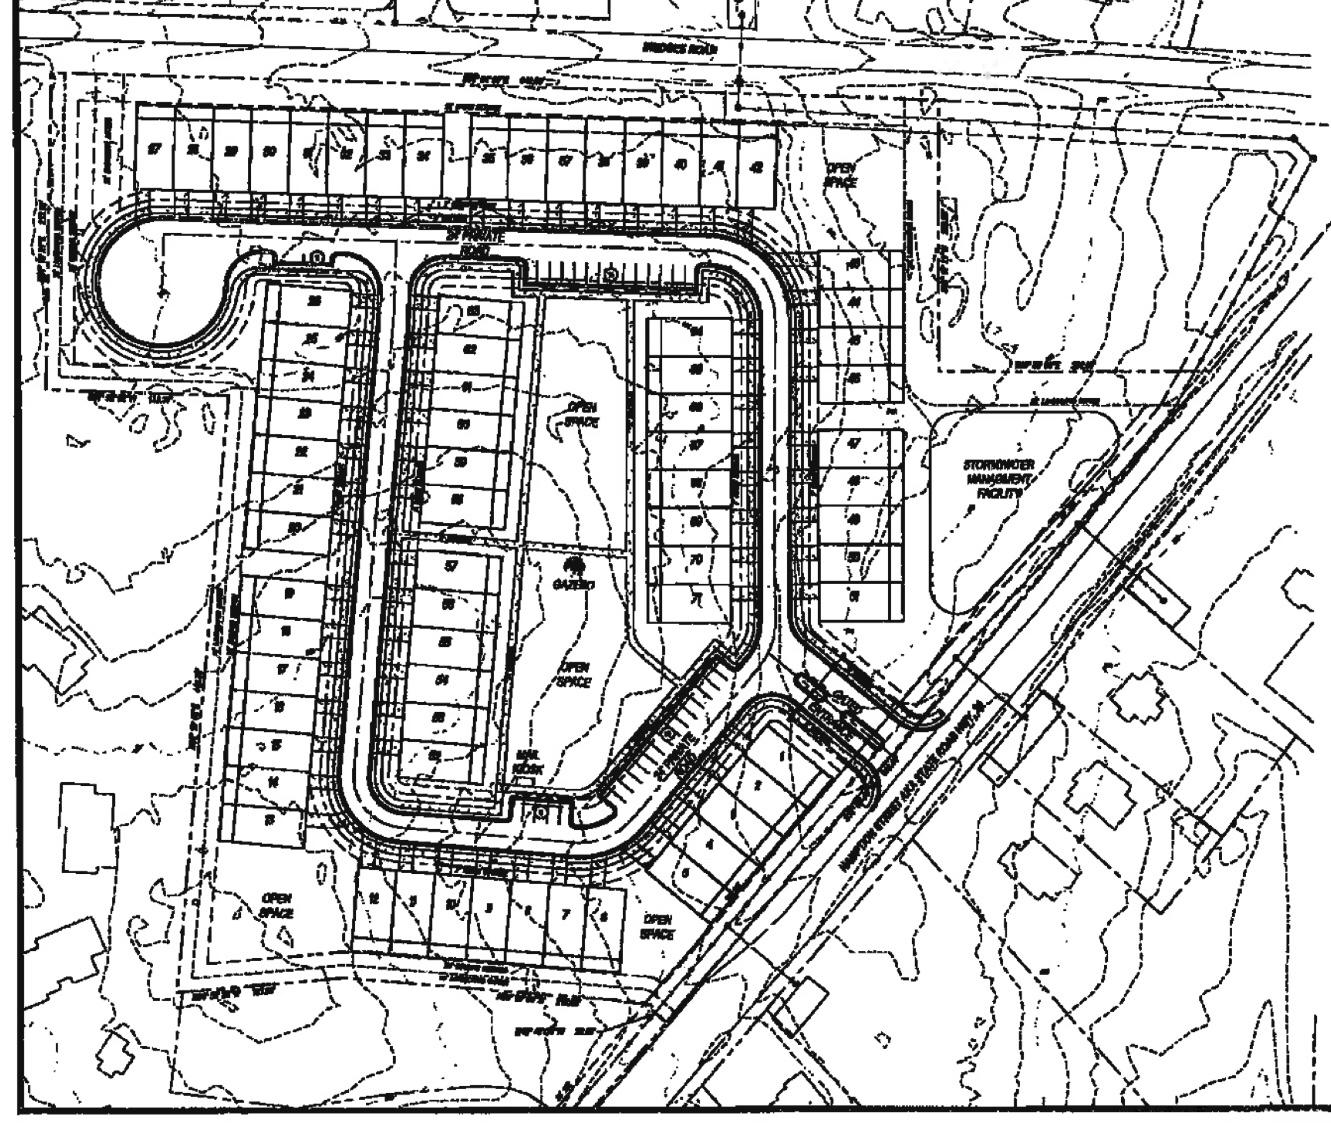 Site Plan for Hampton Street Townhomes